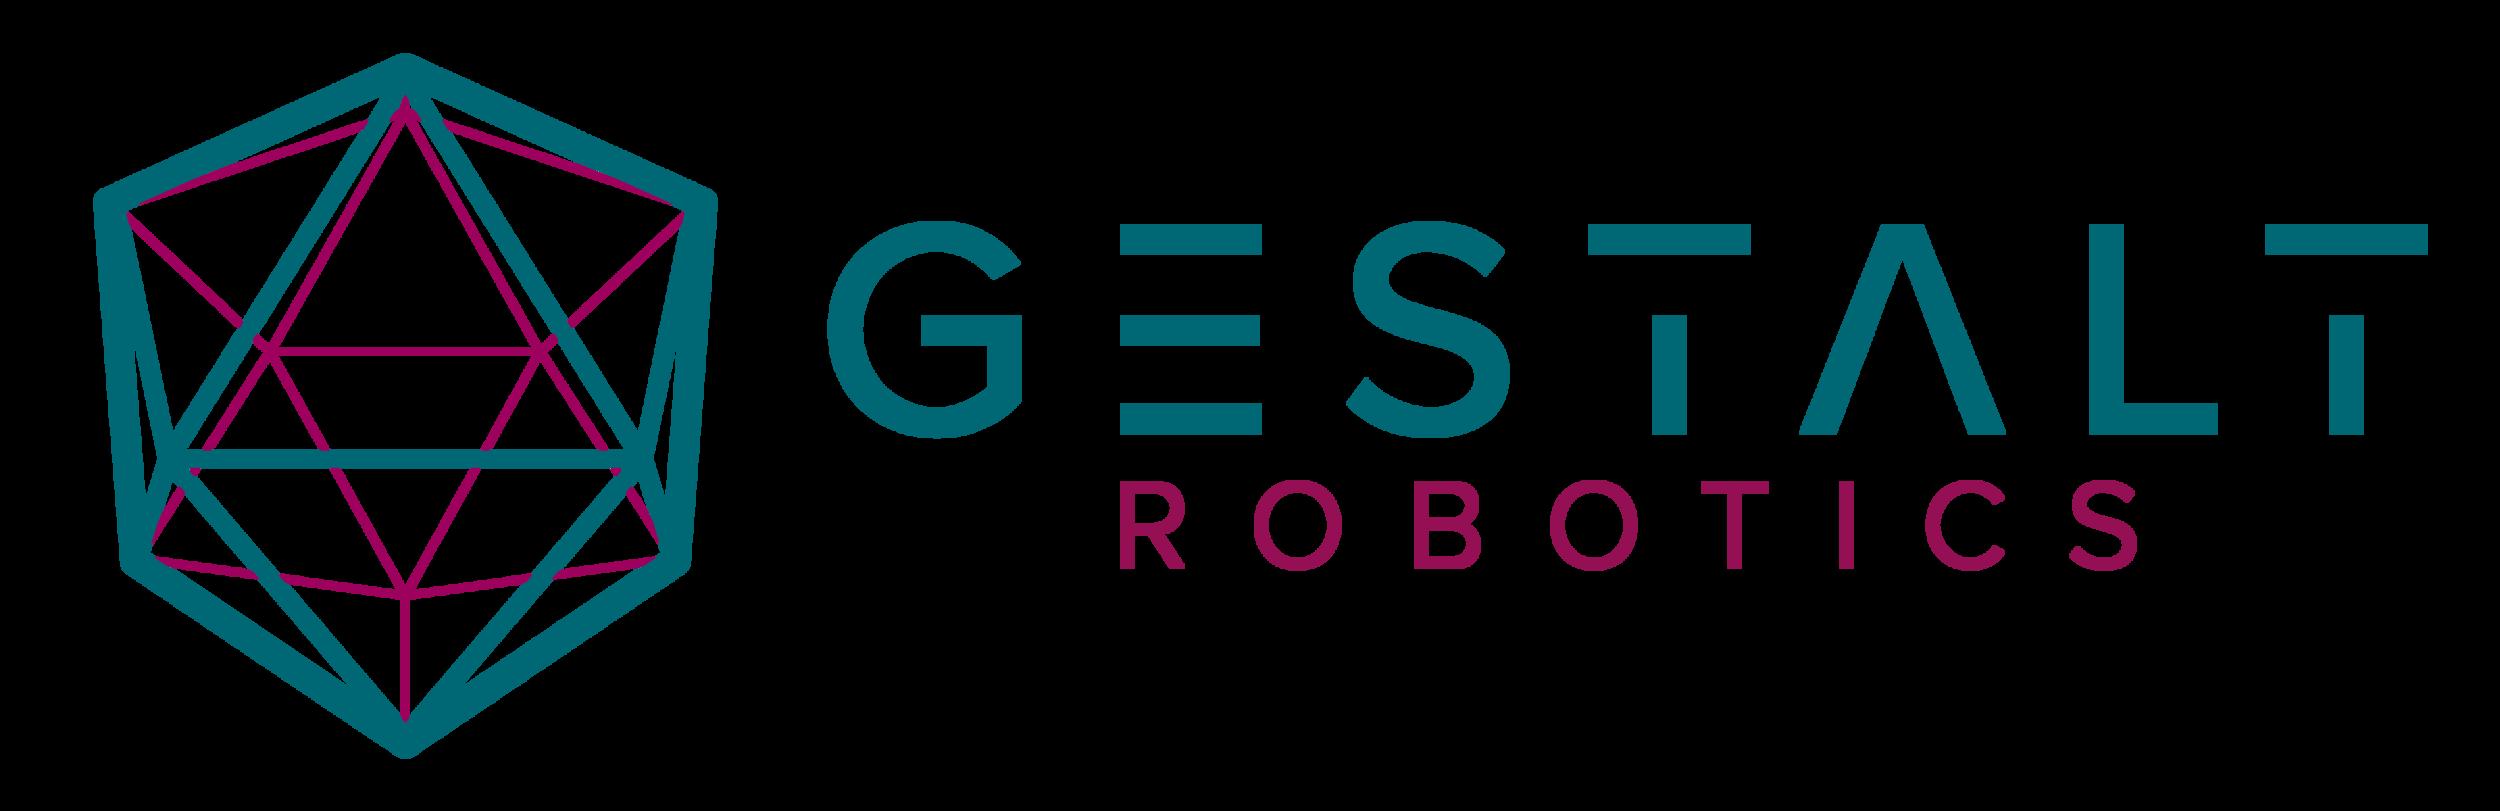 2019-10-Gestalt-Logo_wide_dark.png